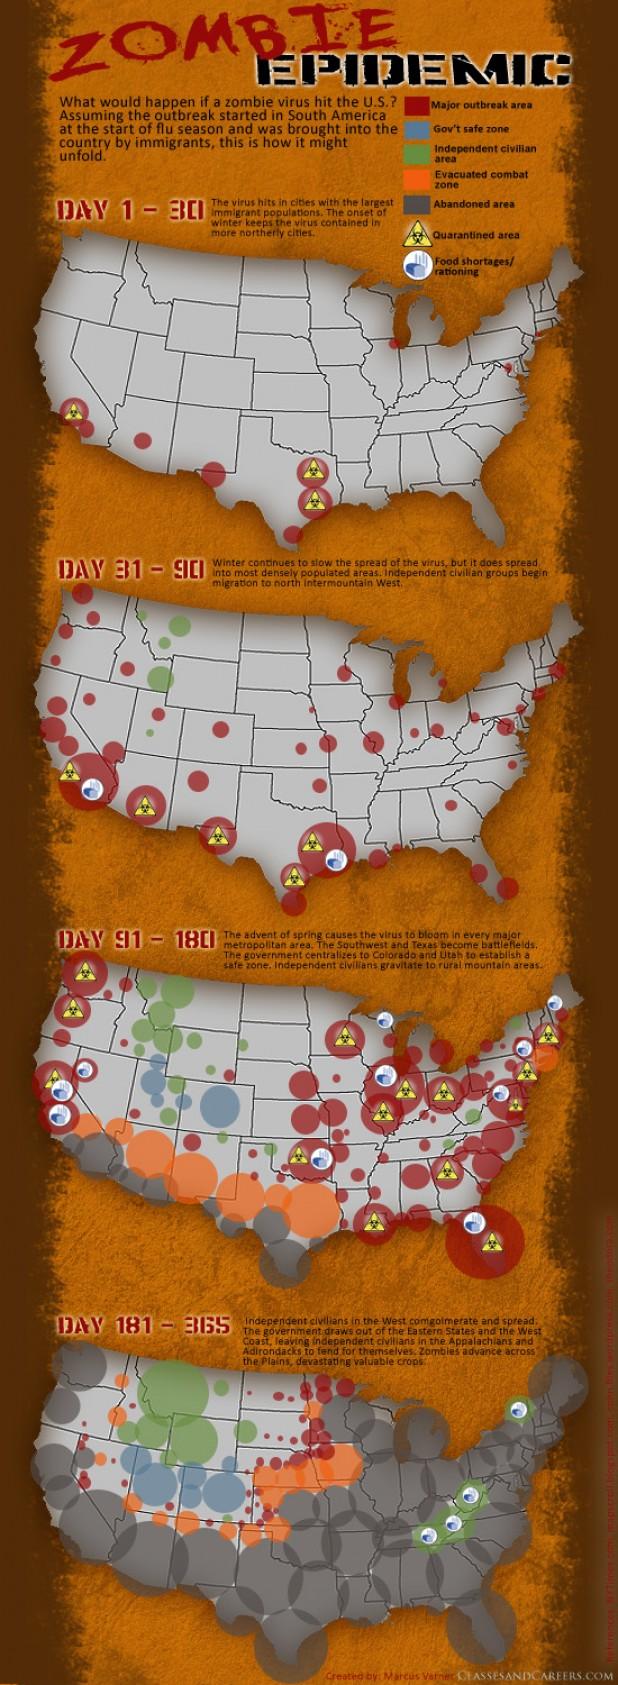 Zombie Epidemic